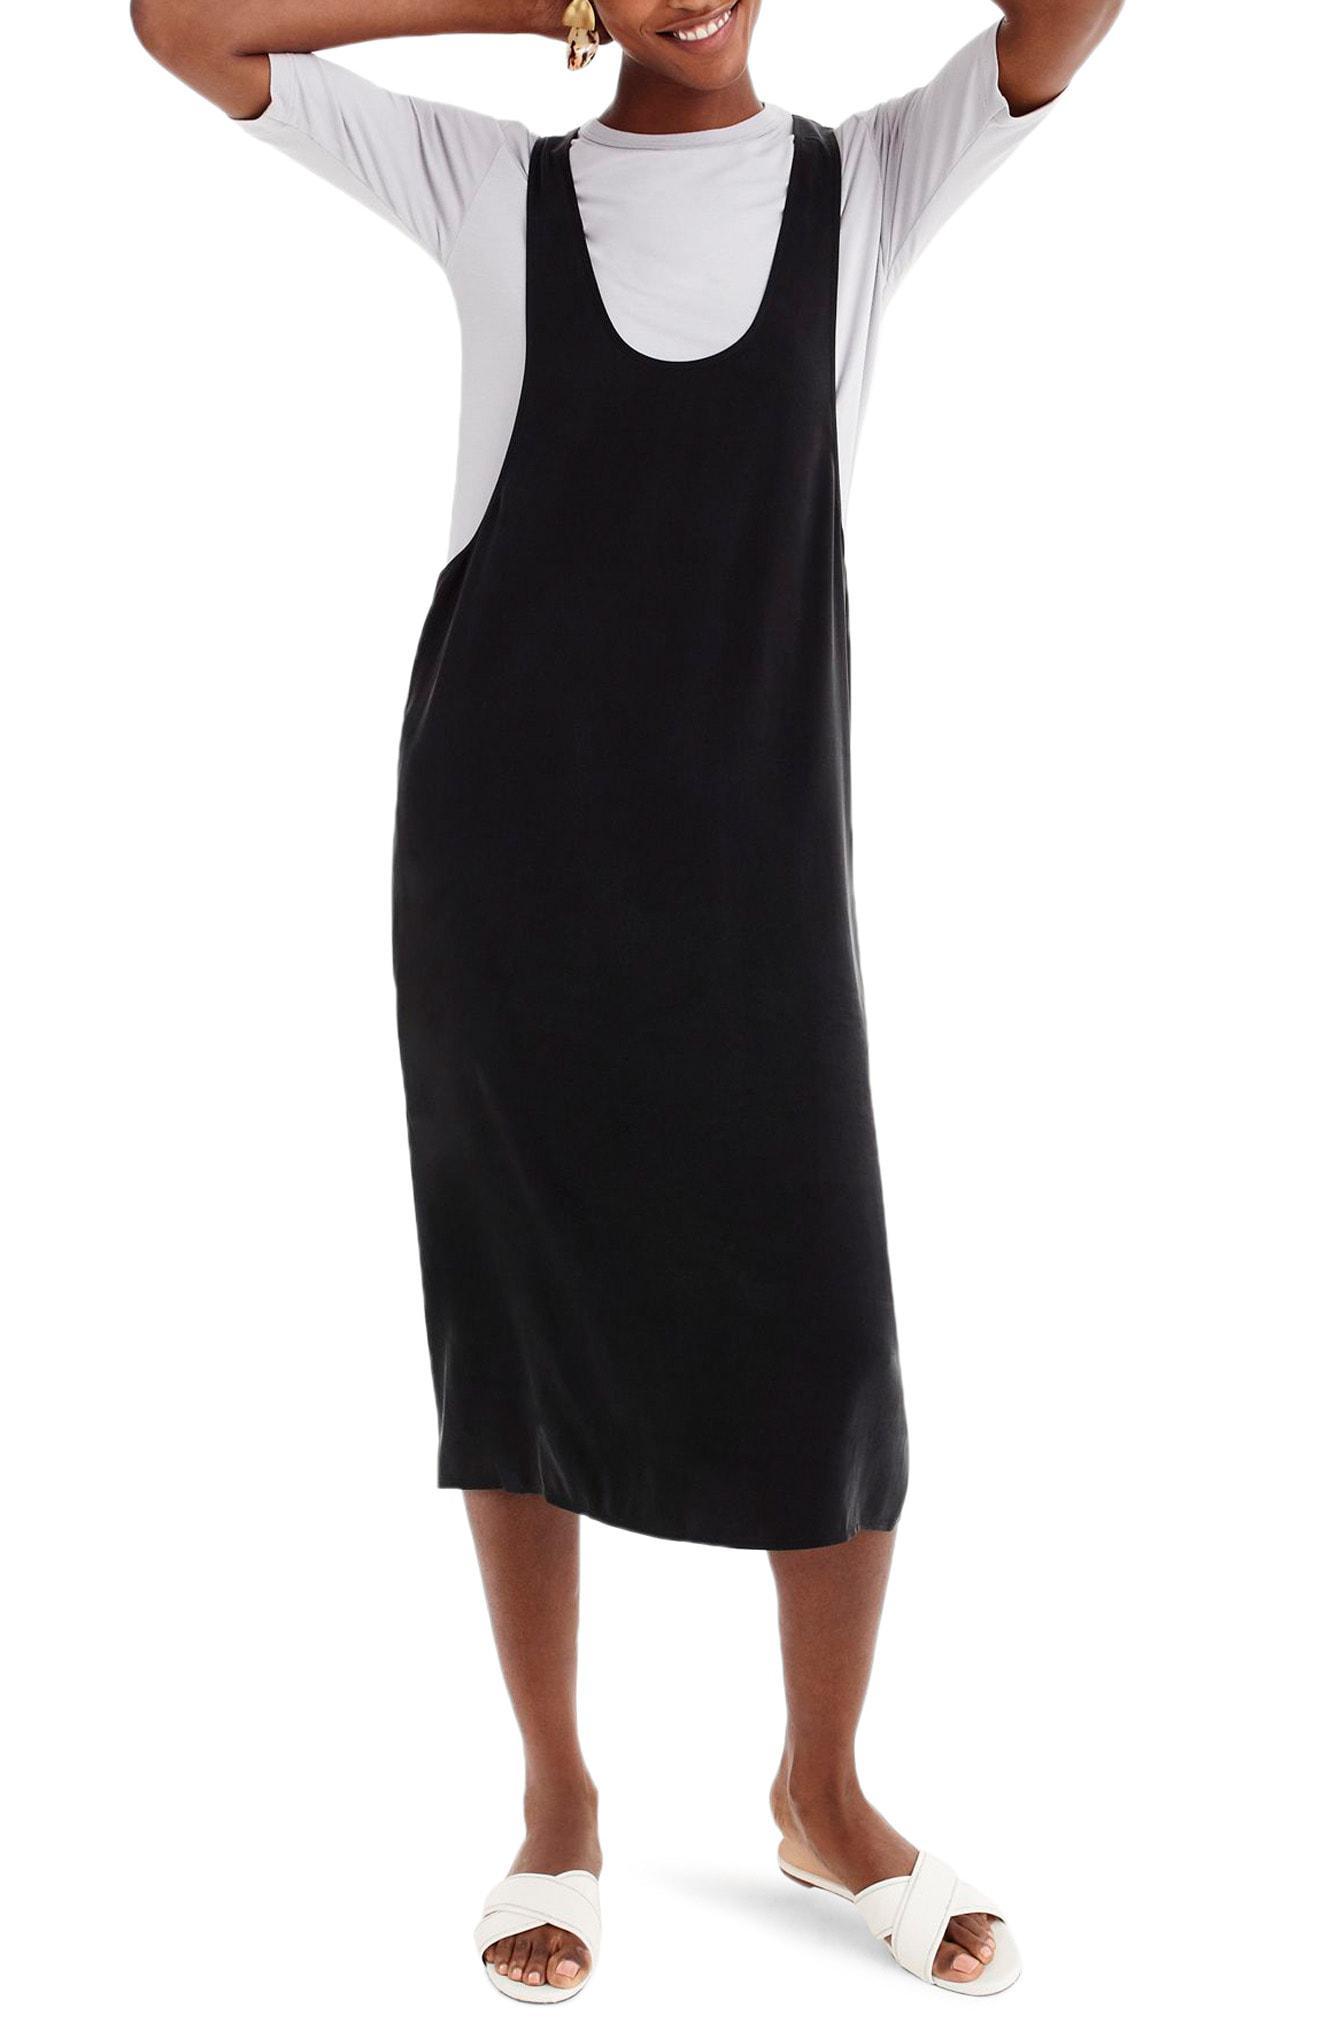 6e354286939 UNIVERSAL STANDARD. Women s Gray For J.crew Cupro Blend Layering Tank Dress